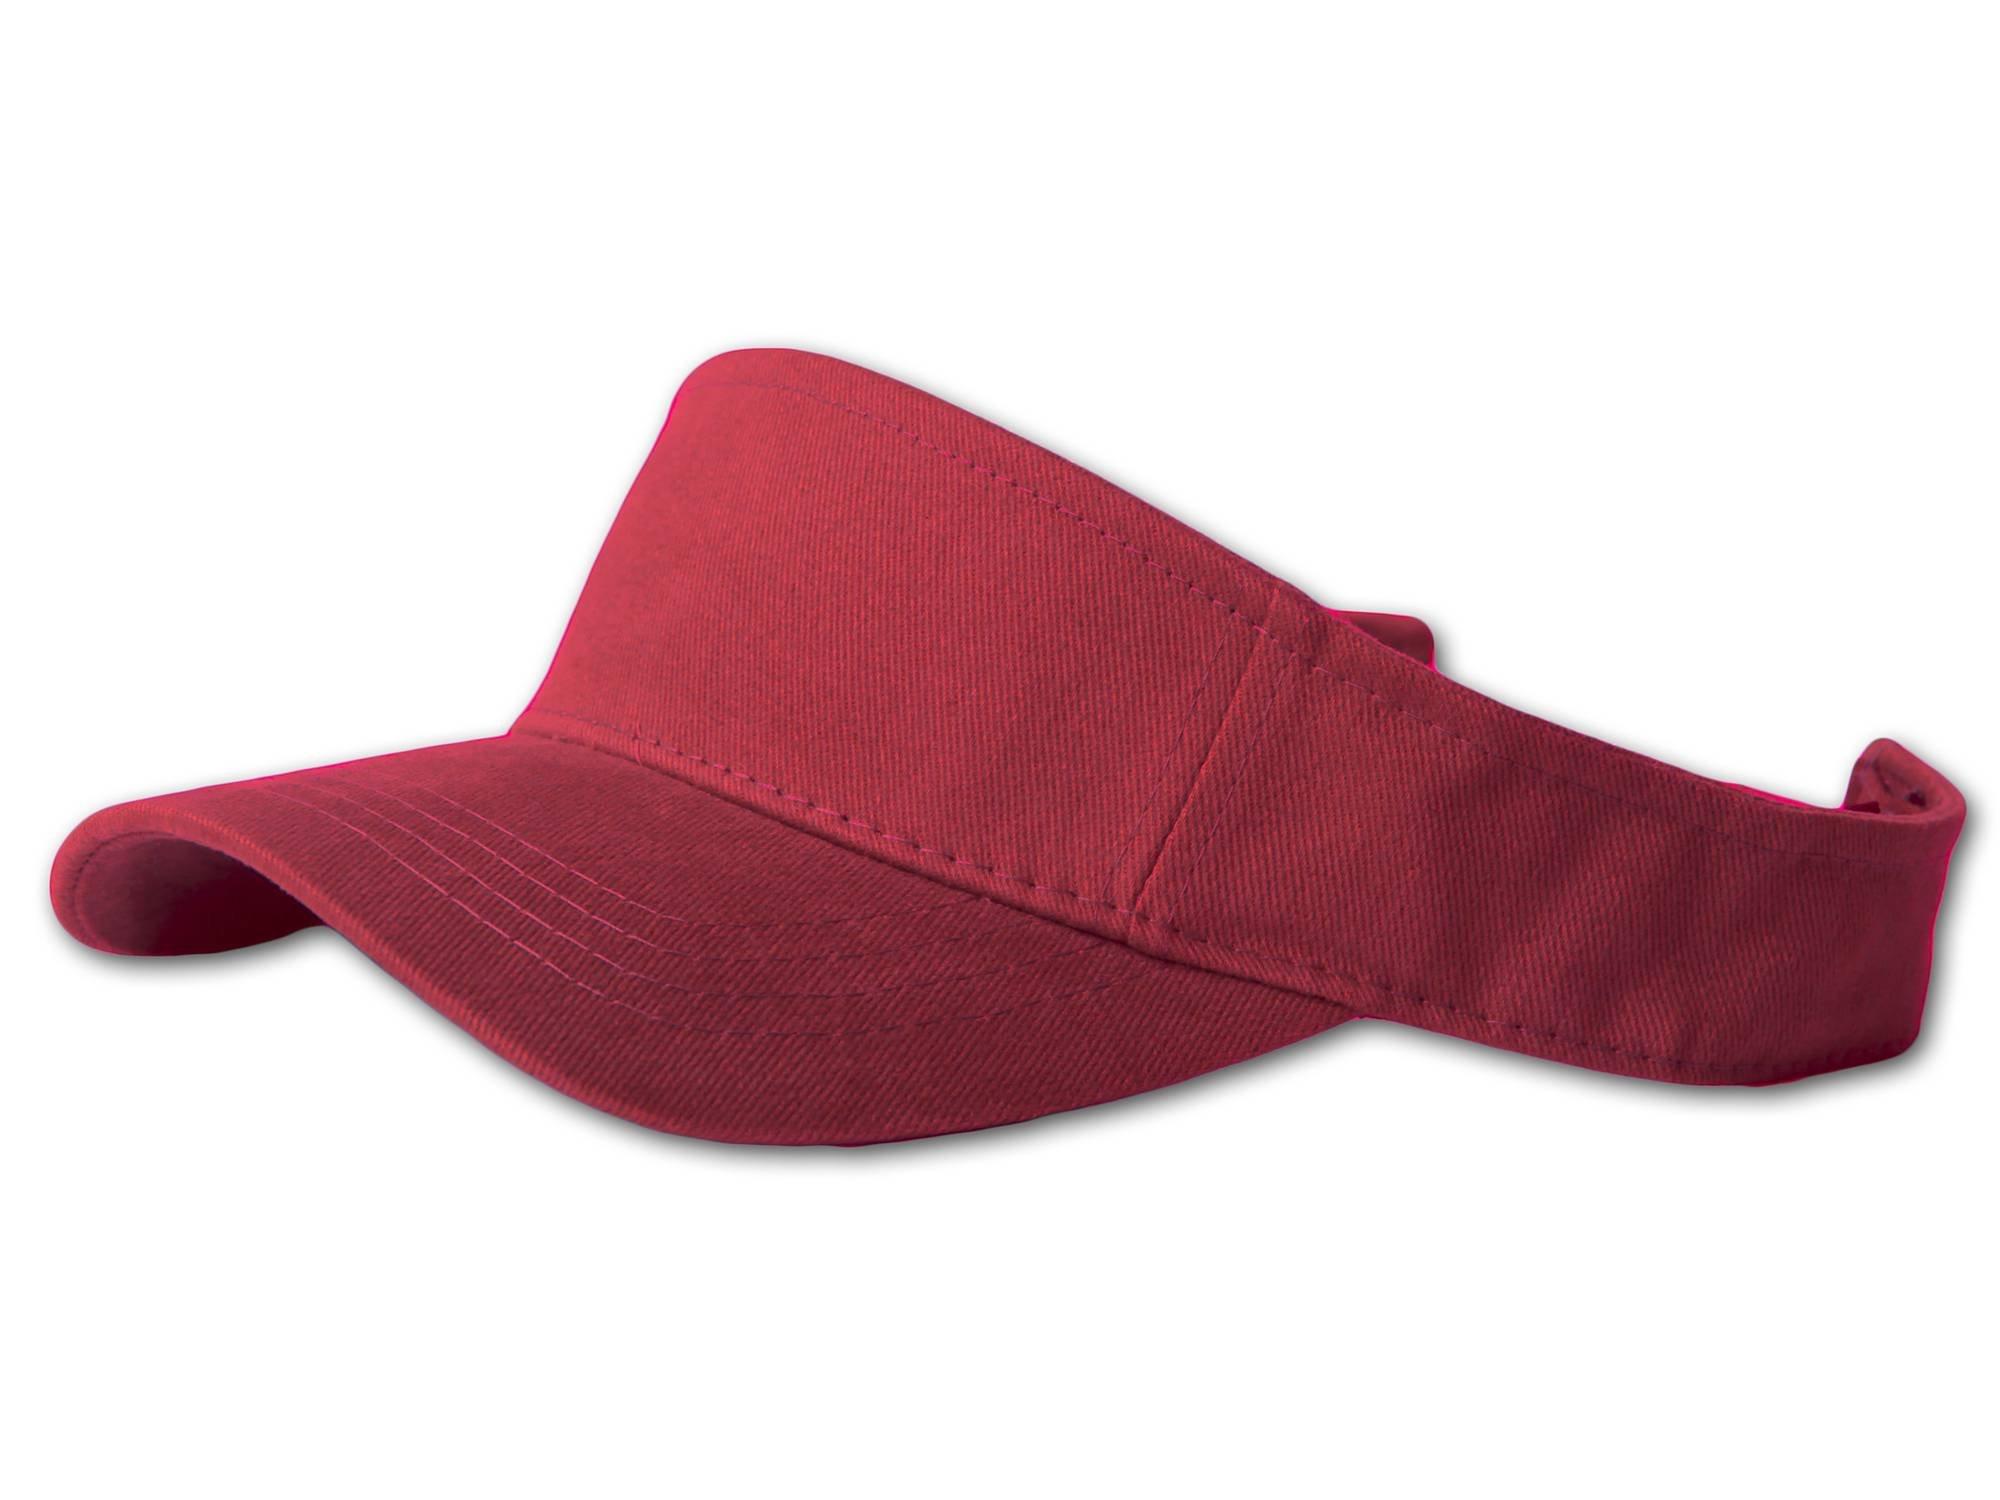 12 Lot (One Color) Visor Caps- Maroon